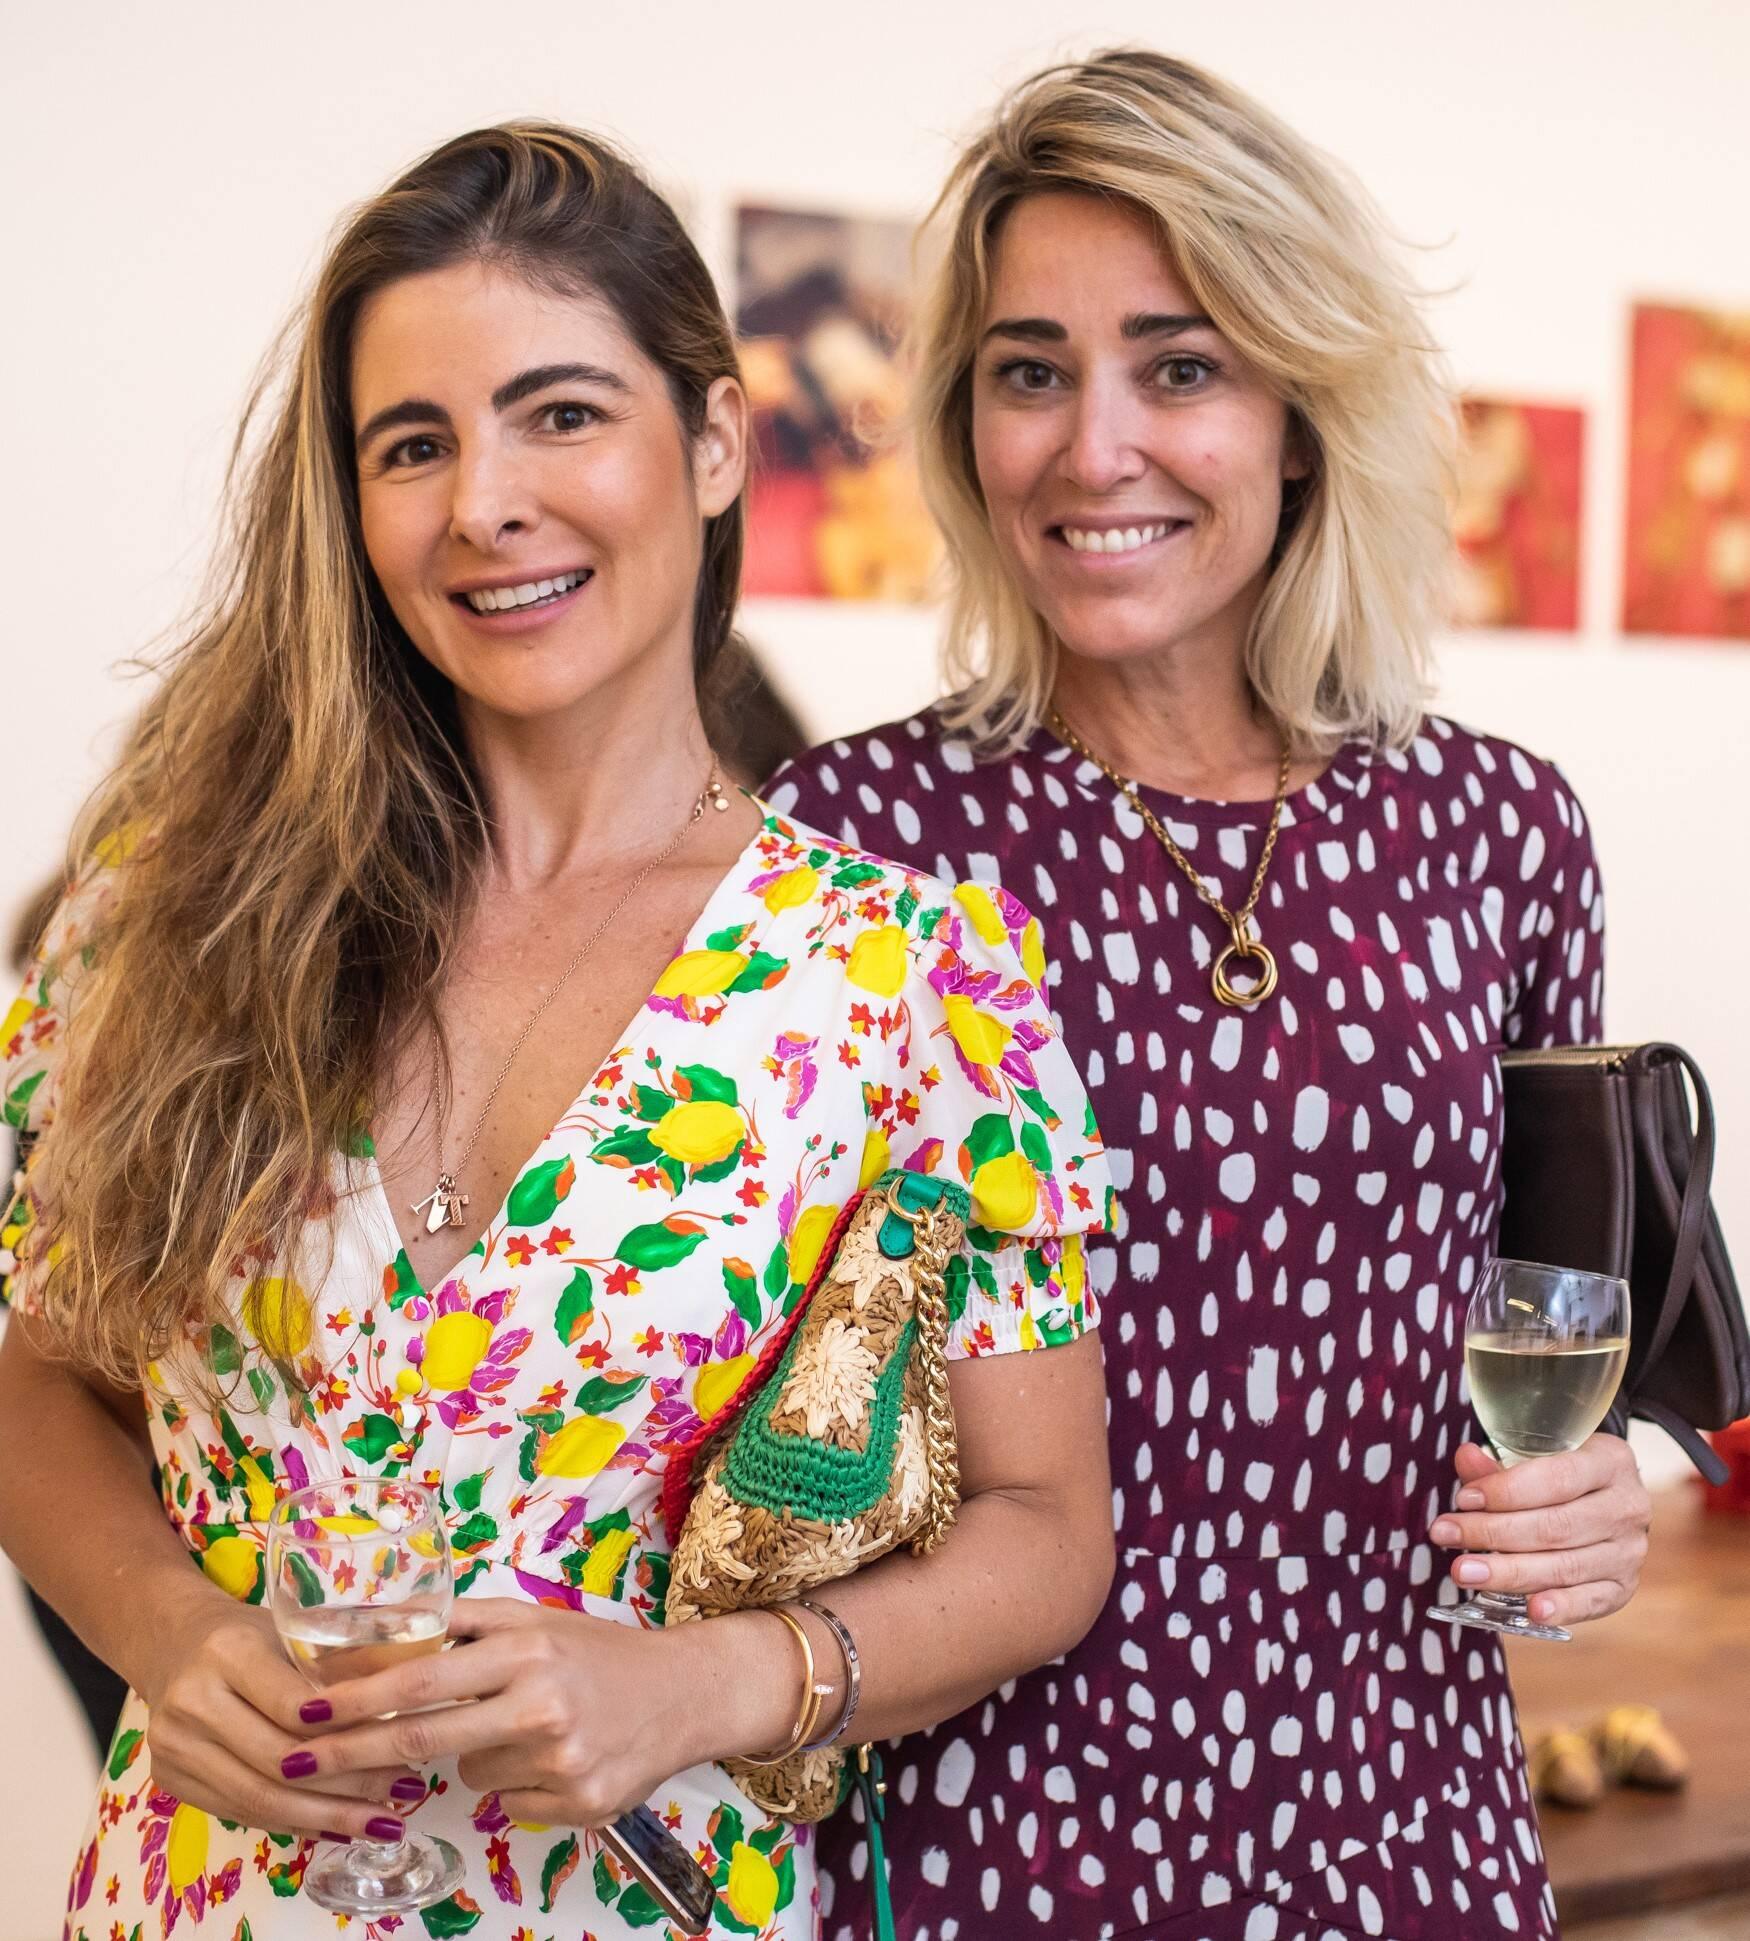 Julia Bleuler e Gabriela Moraes  /Foto: Luke Garcia